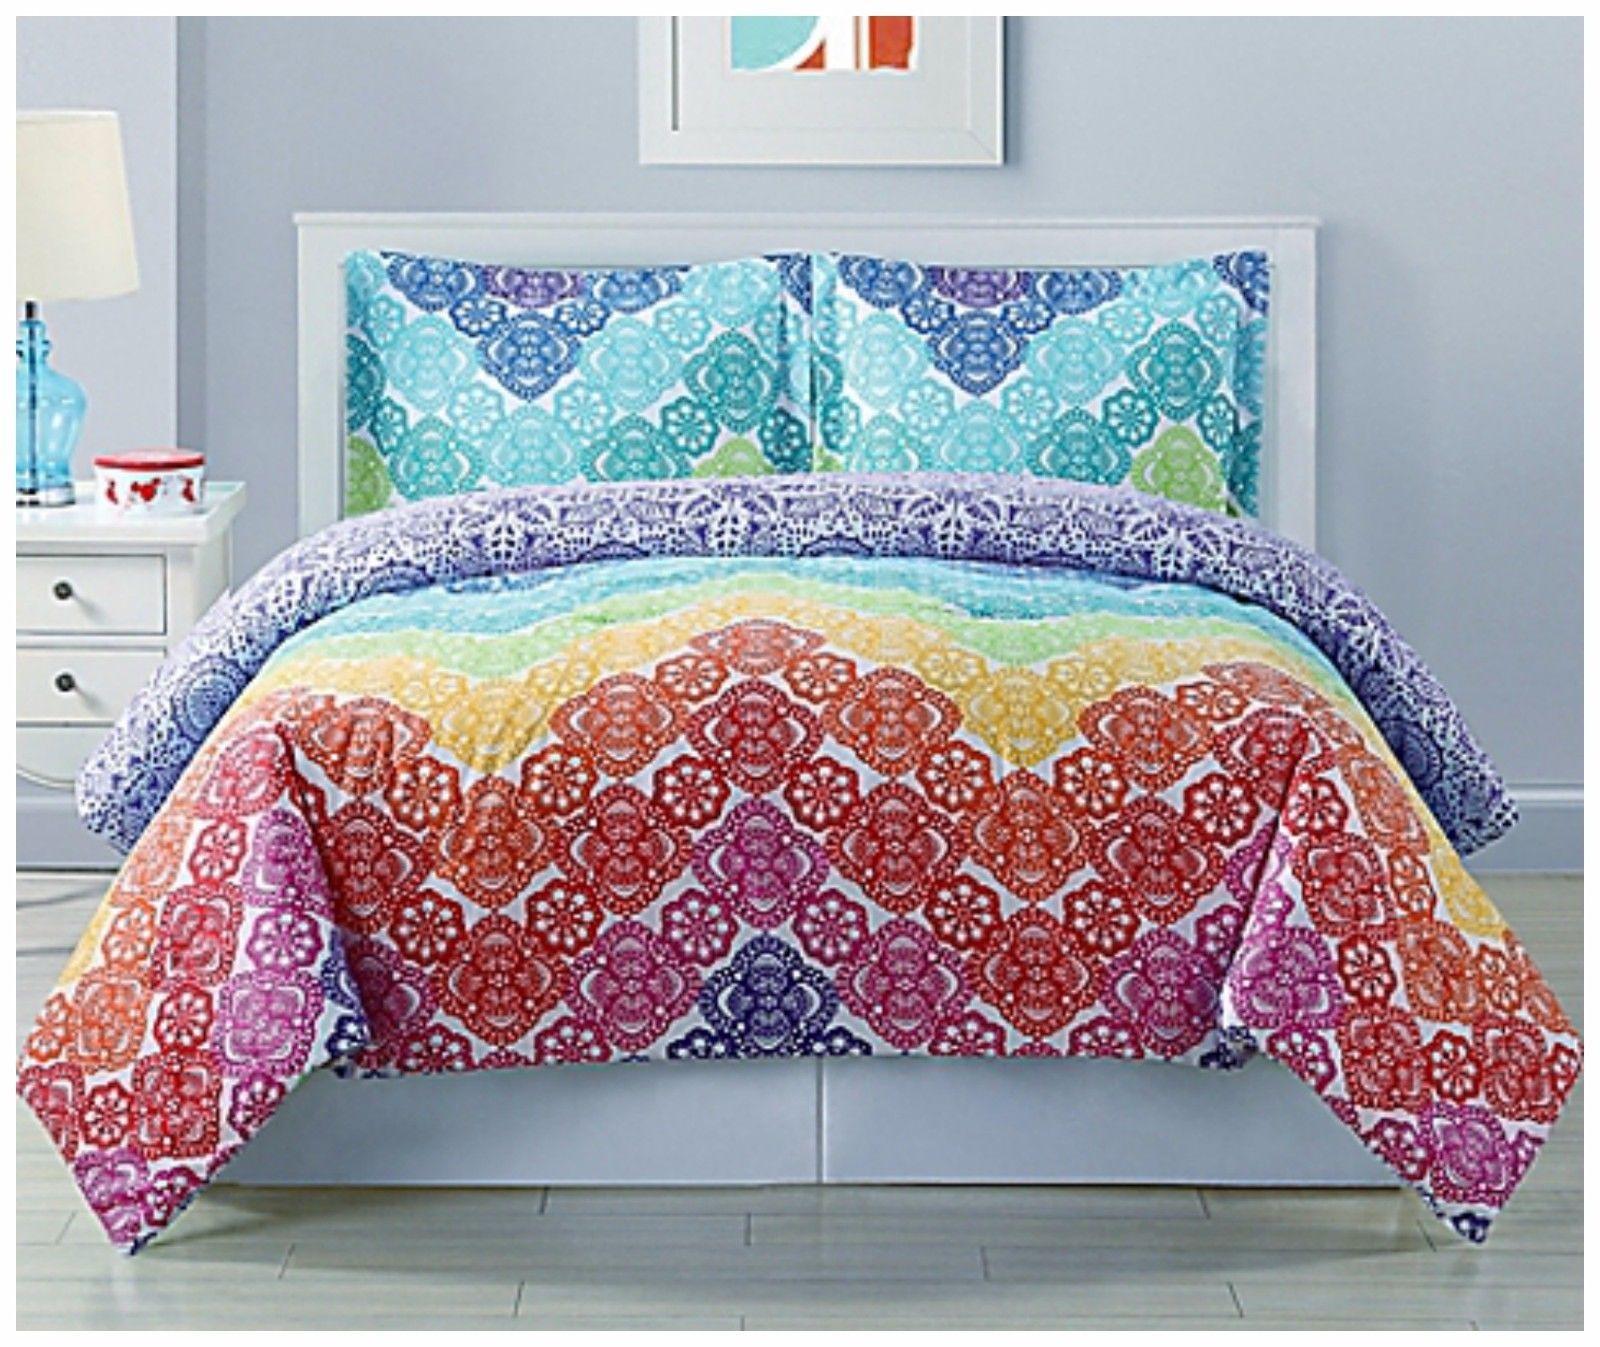 Twin Size forter Set Rainbow Lace Bedding Girls Teen Bedroom